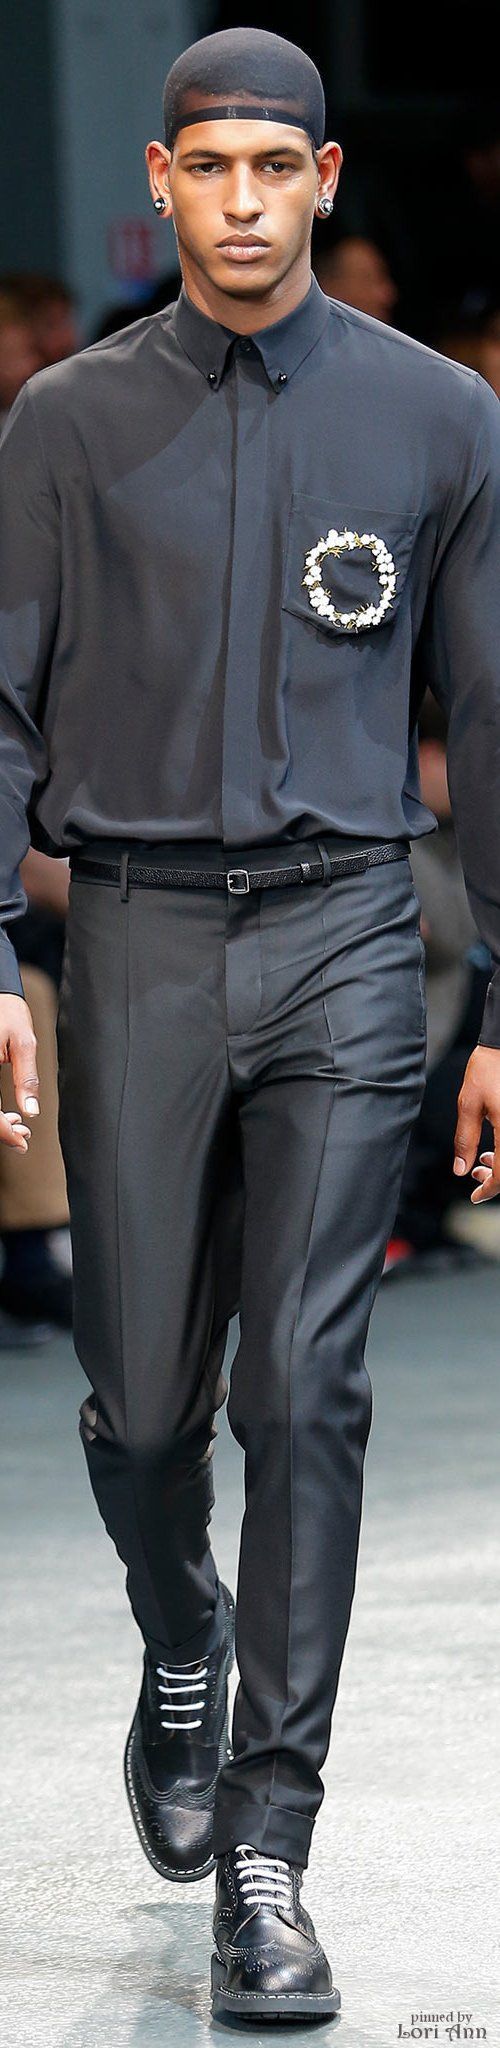 Givenchy Spring 2015 Menswear